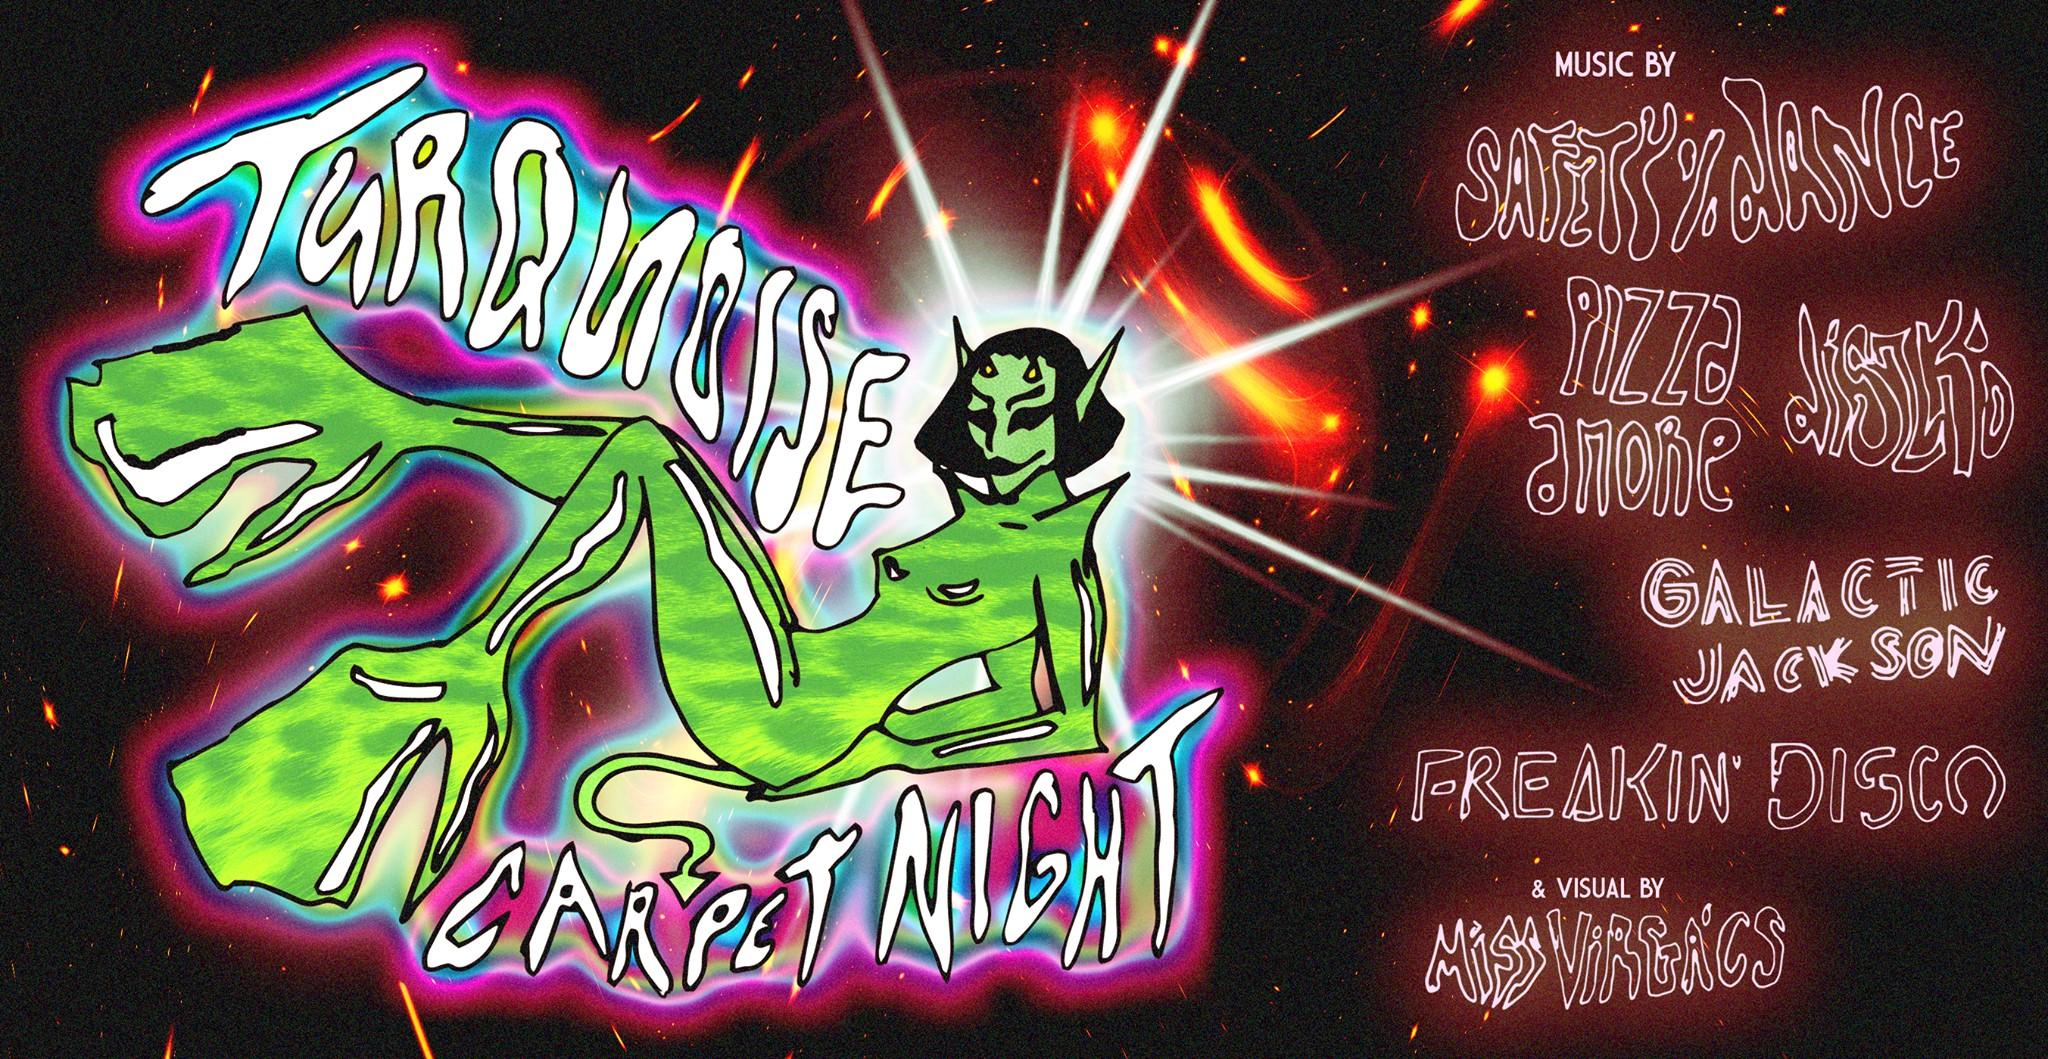 Freakin' Disco koncert 2019. március 1-j-én, Budapesten, az Ambientben